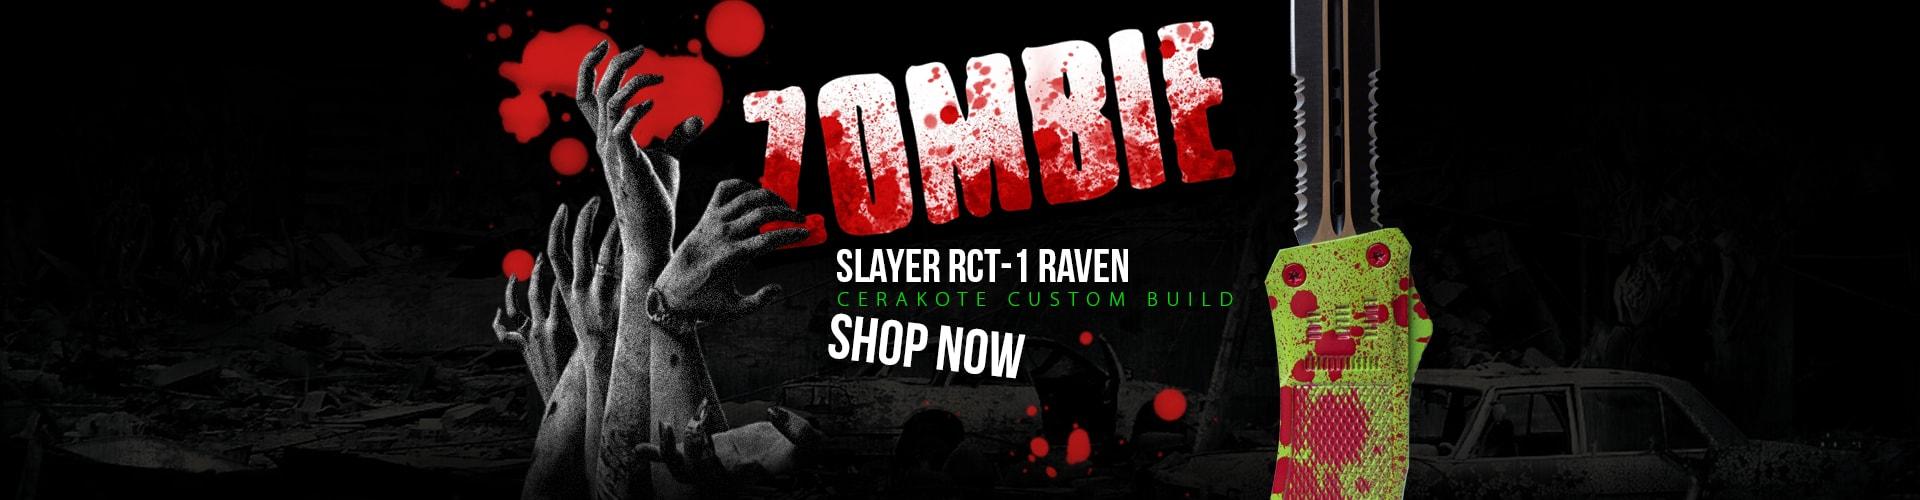 ZombieSlayerCerakote_RotateBanner